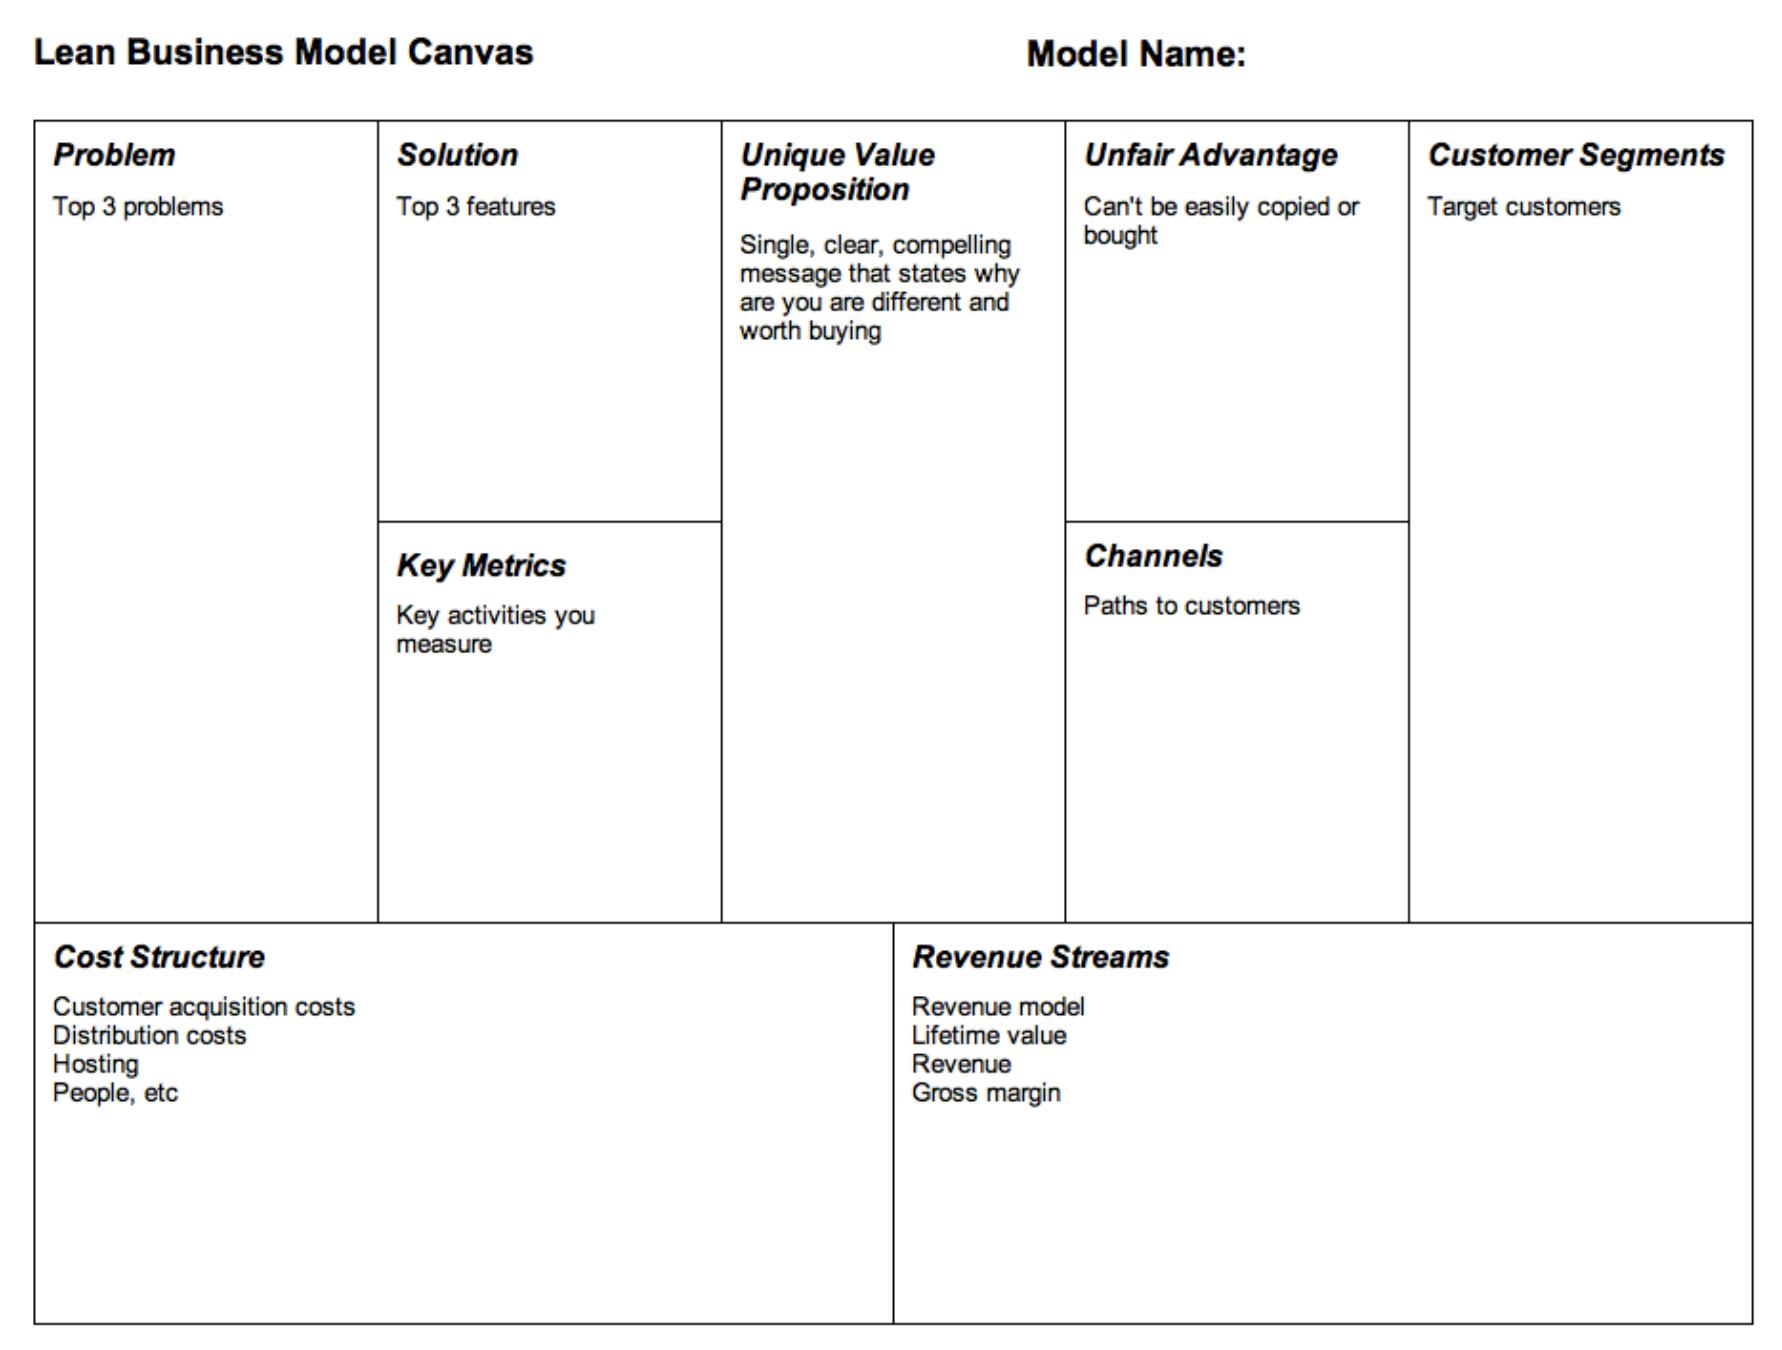 Lean business model canvas | Pdf | Startup business plan